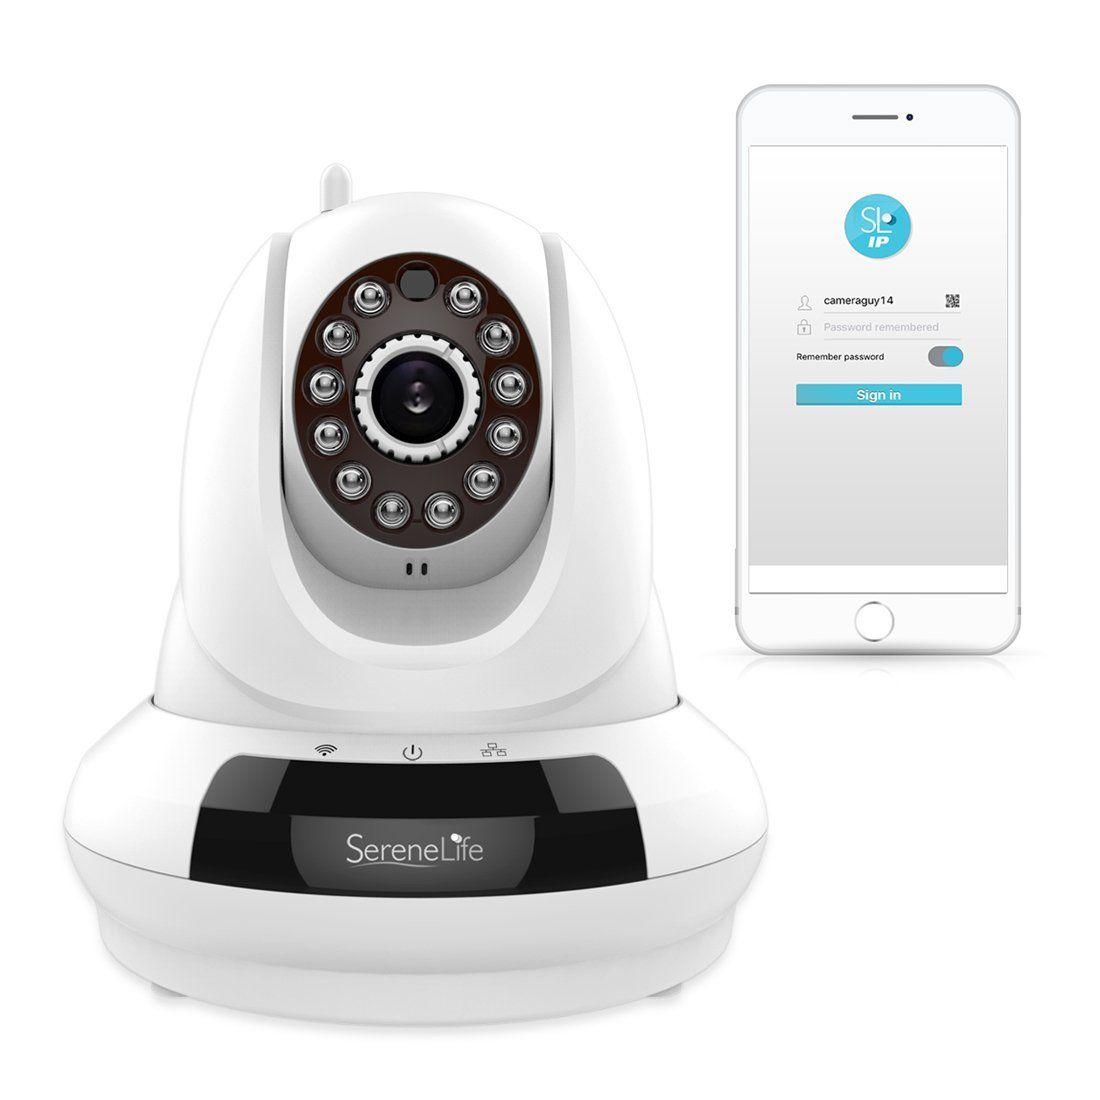 SereneLife IPCAMHD61 HD Wireless Security IP